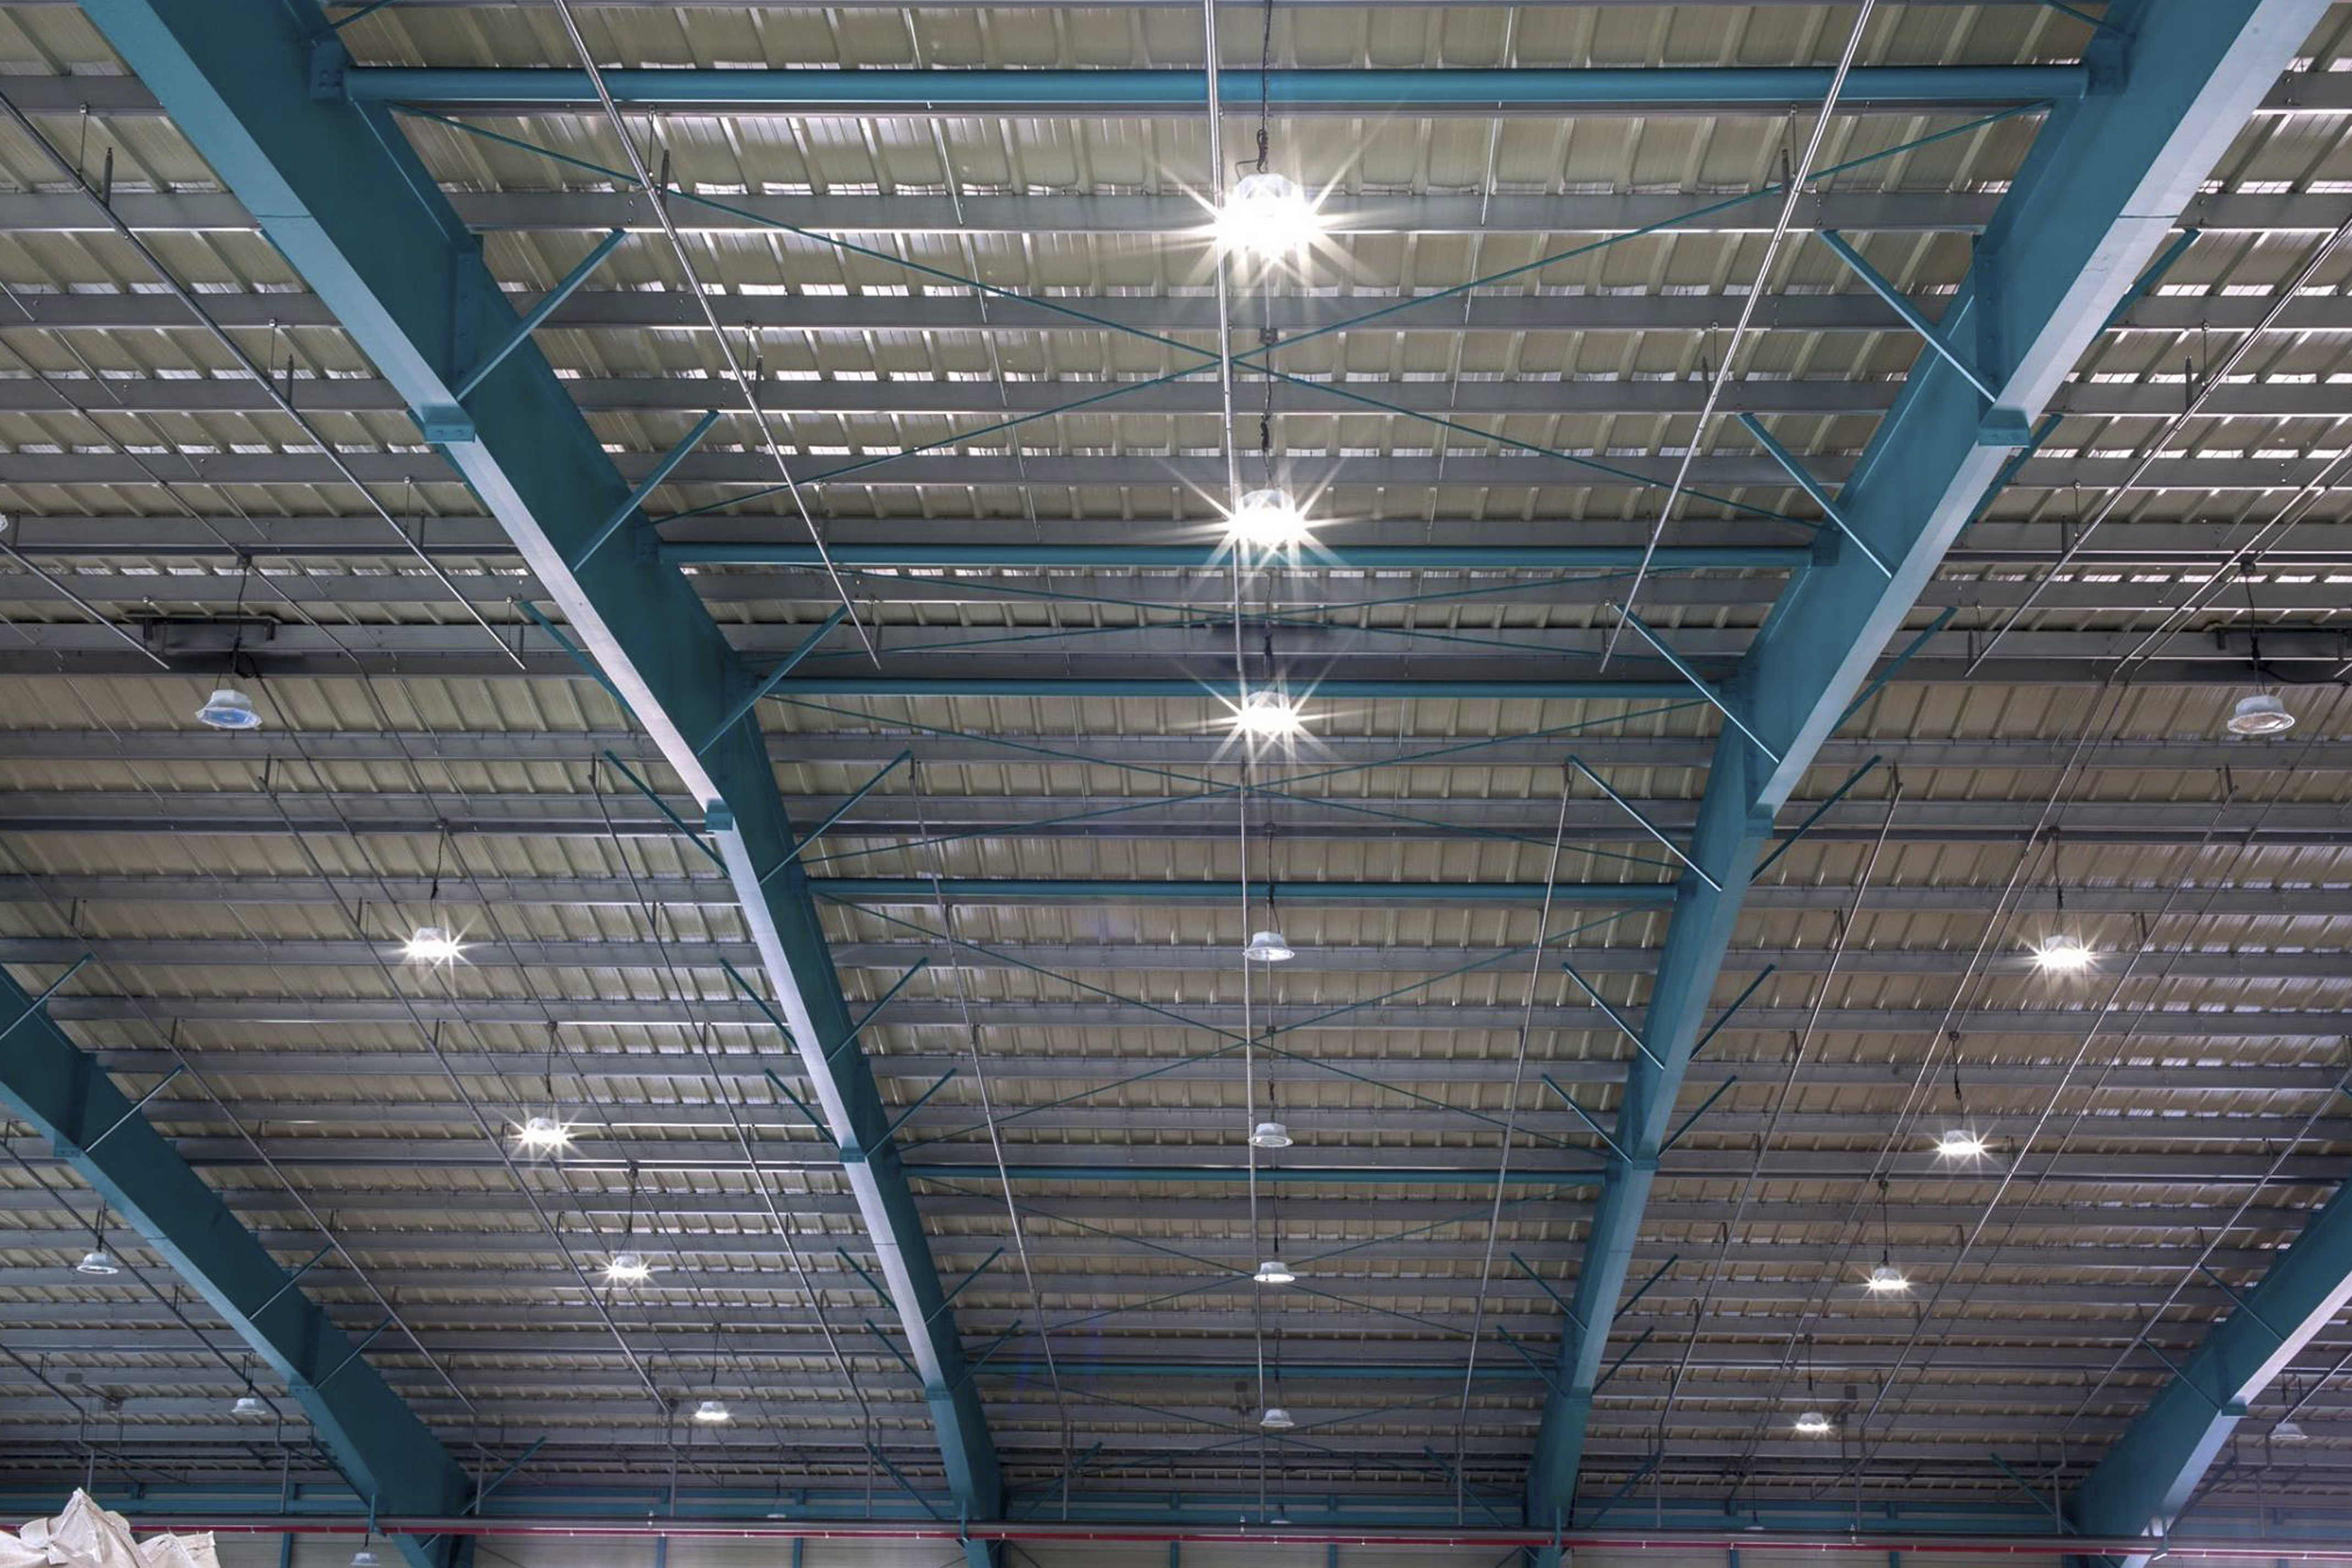 projecteur-sega-hybrid-eclairage-industriel